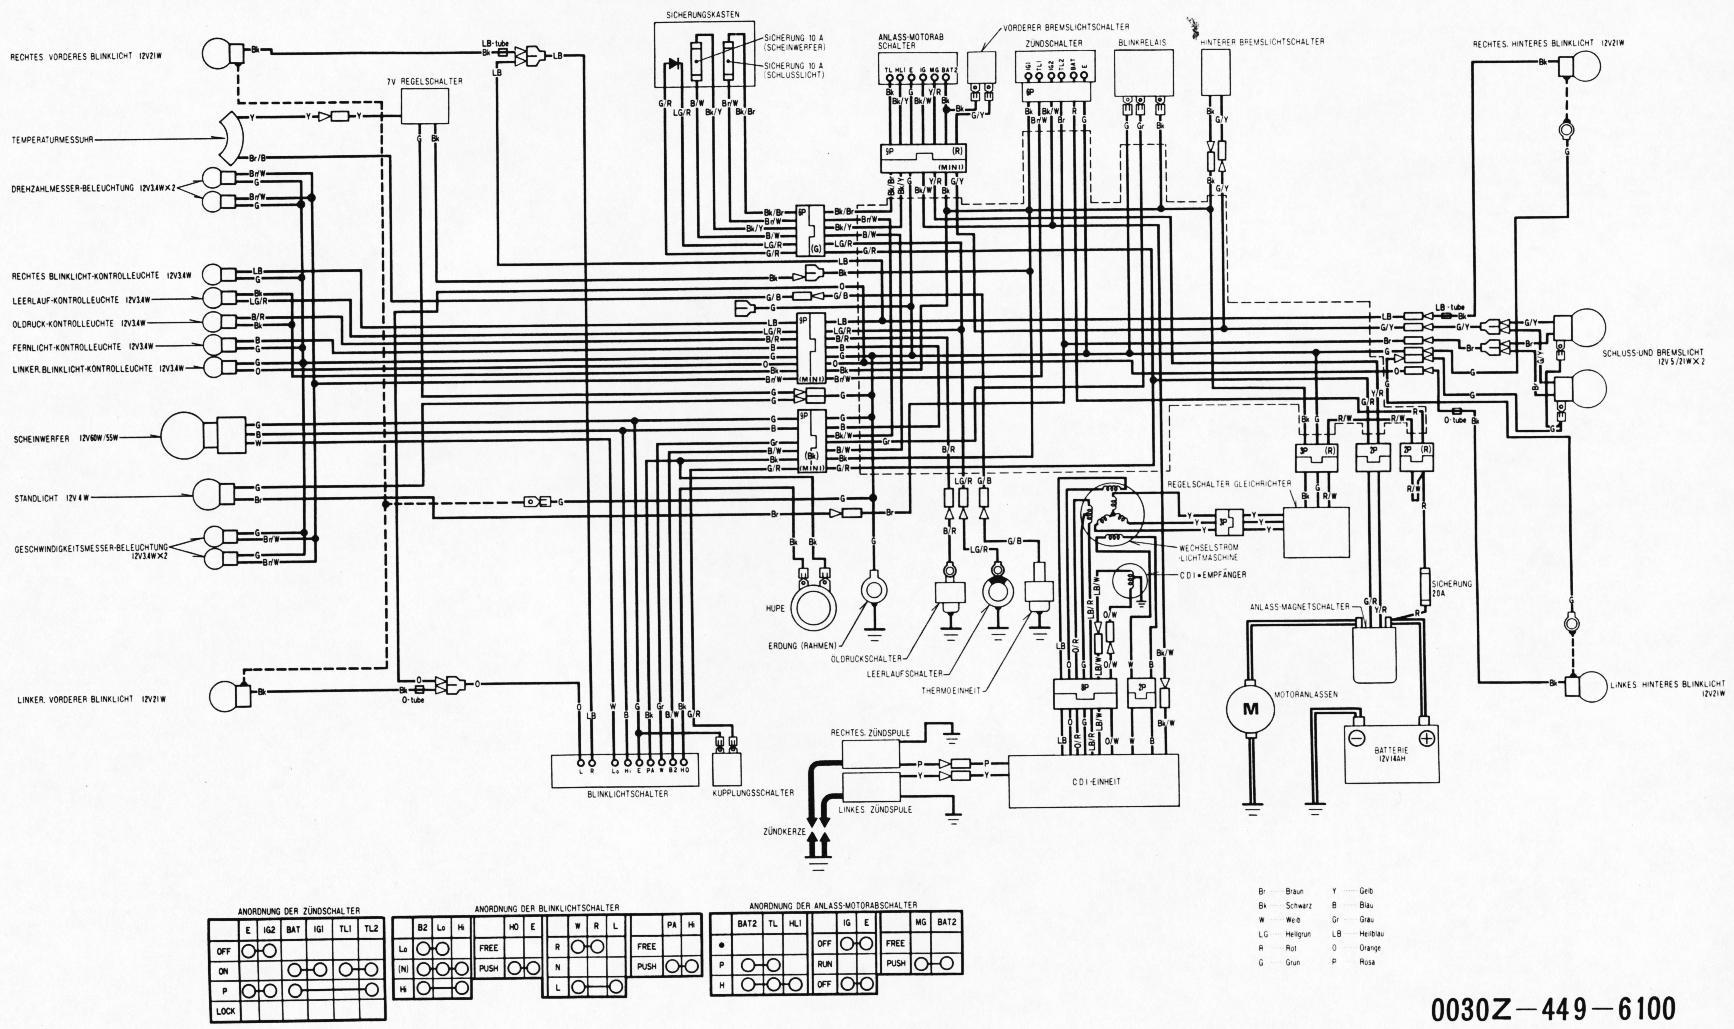 File:1980 honda cx500 wiring diagram cx500c deu.jpg